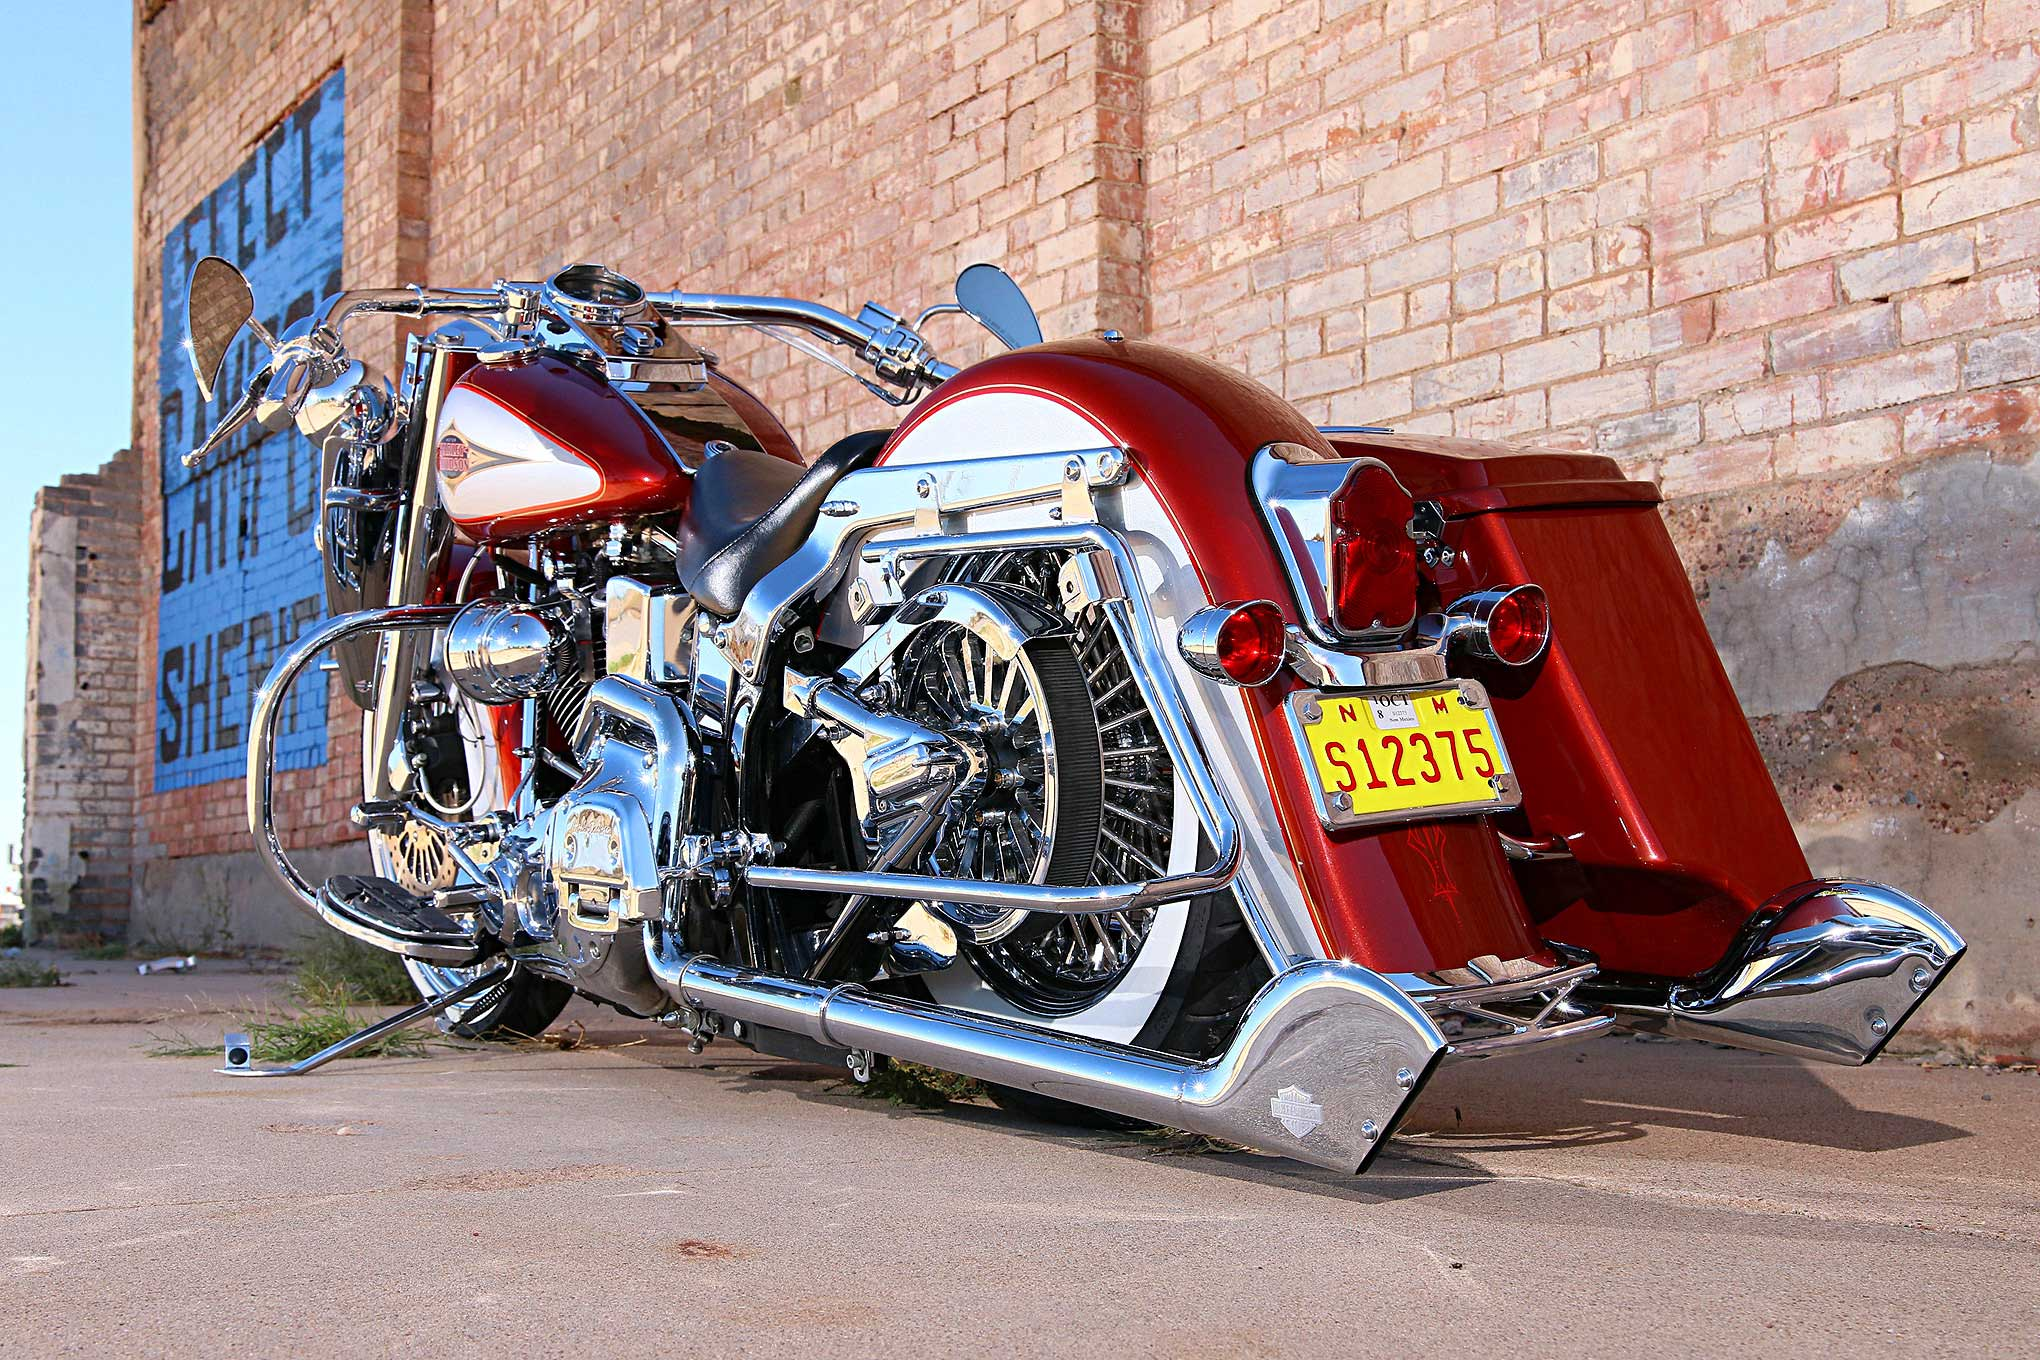 1999 Harley Davidson Heritage Softail Fishtail Exhaust Tips 01 Lowrider